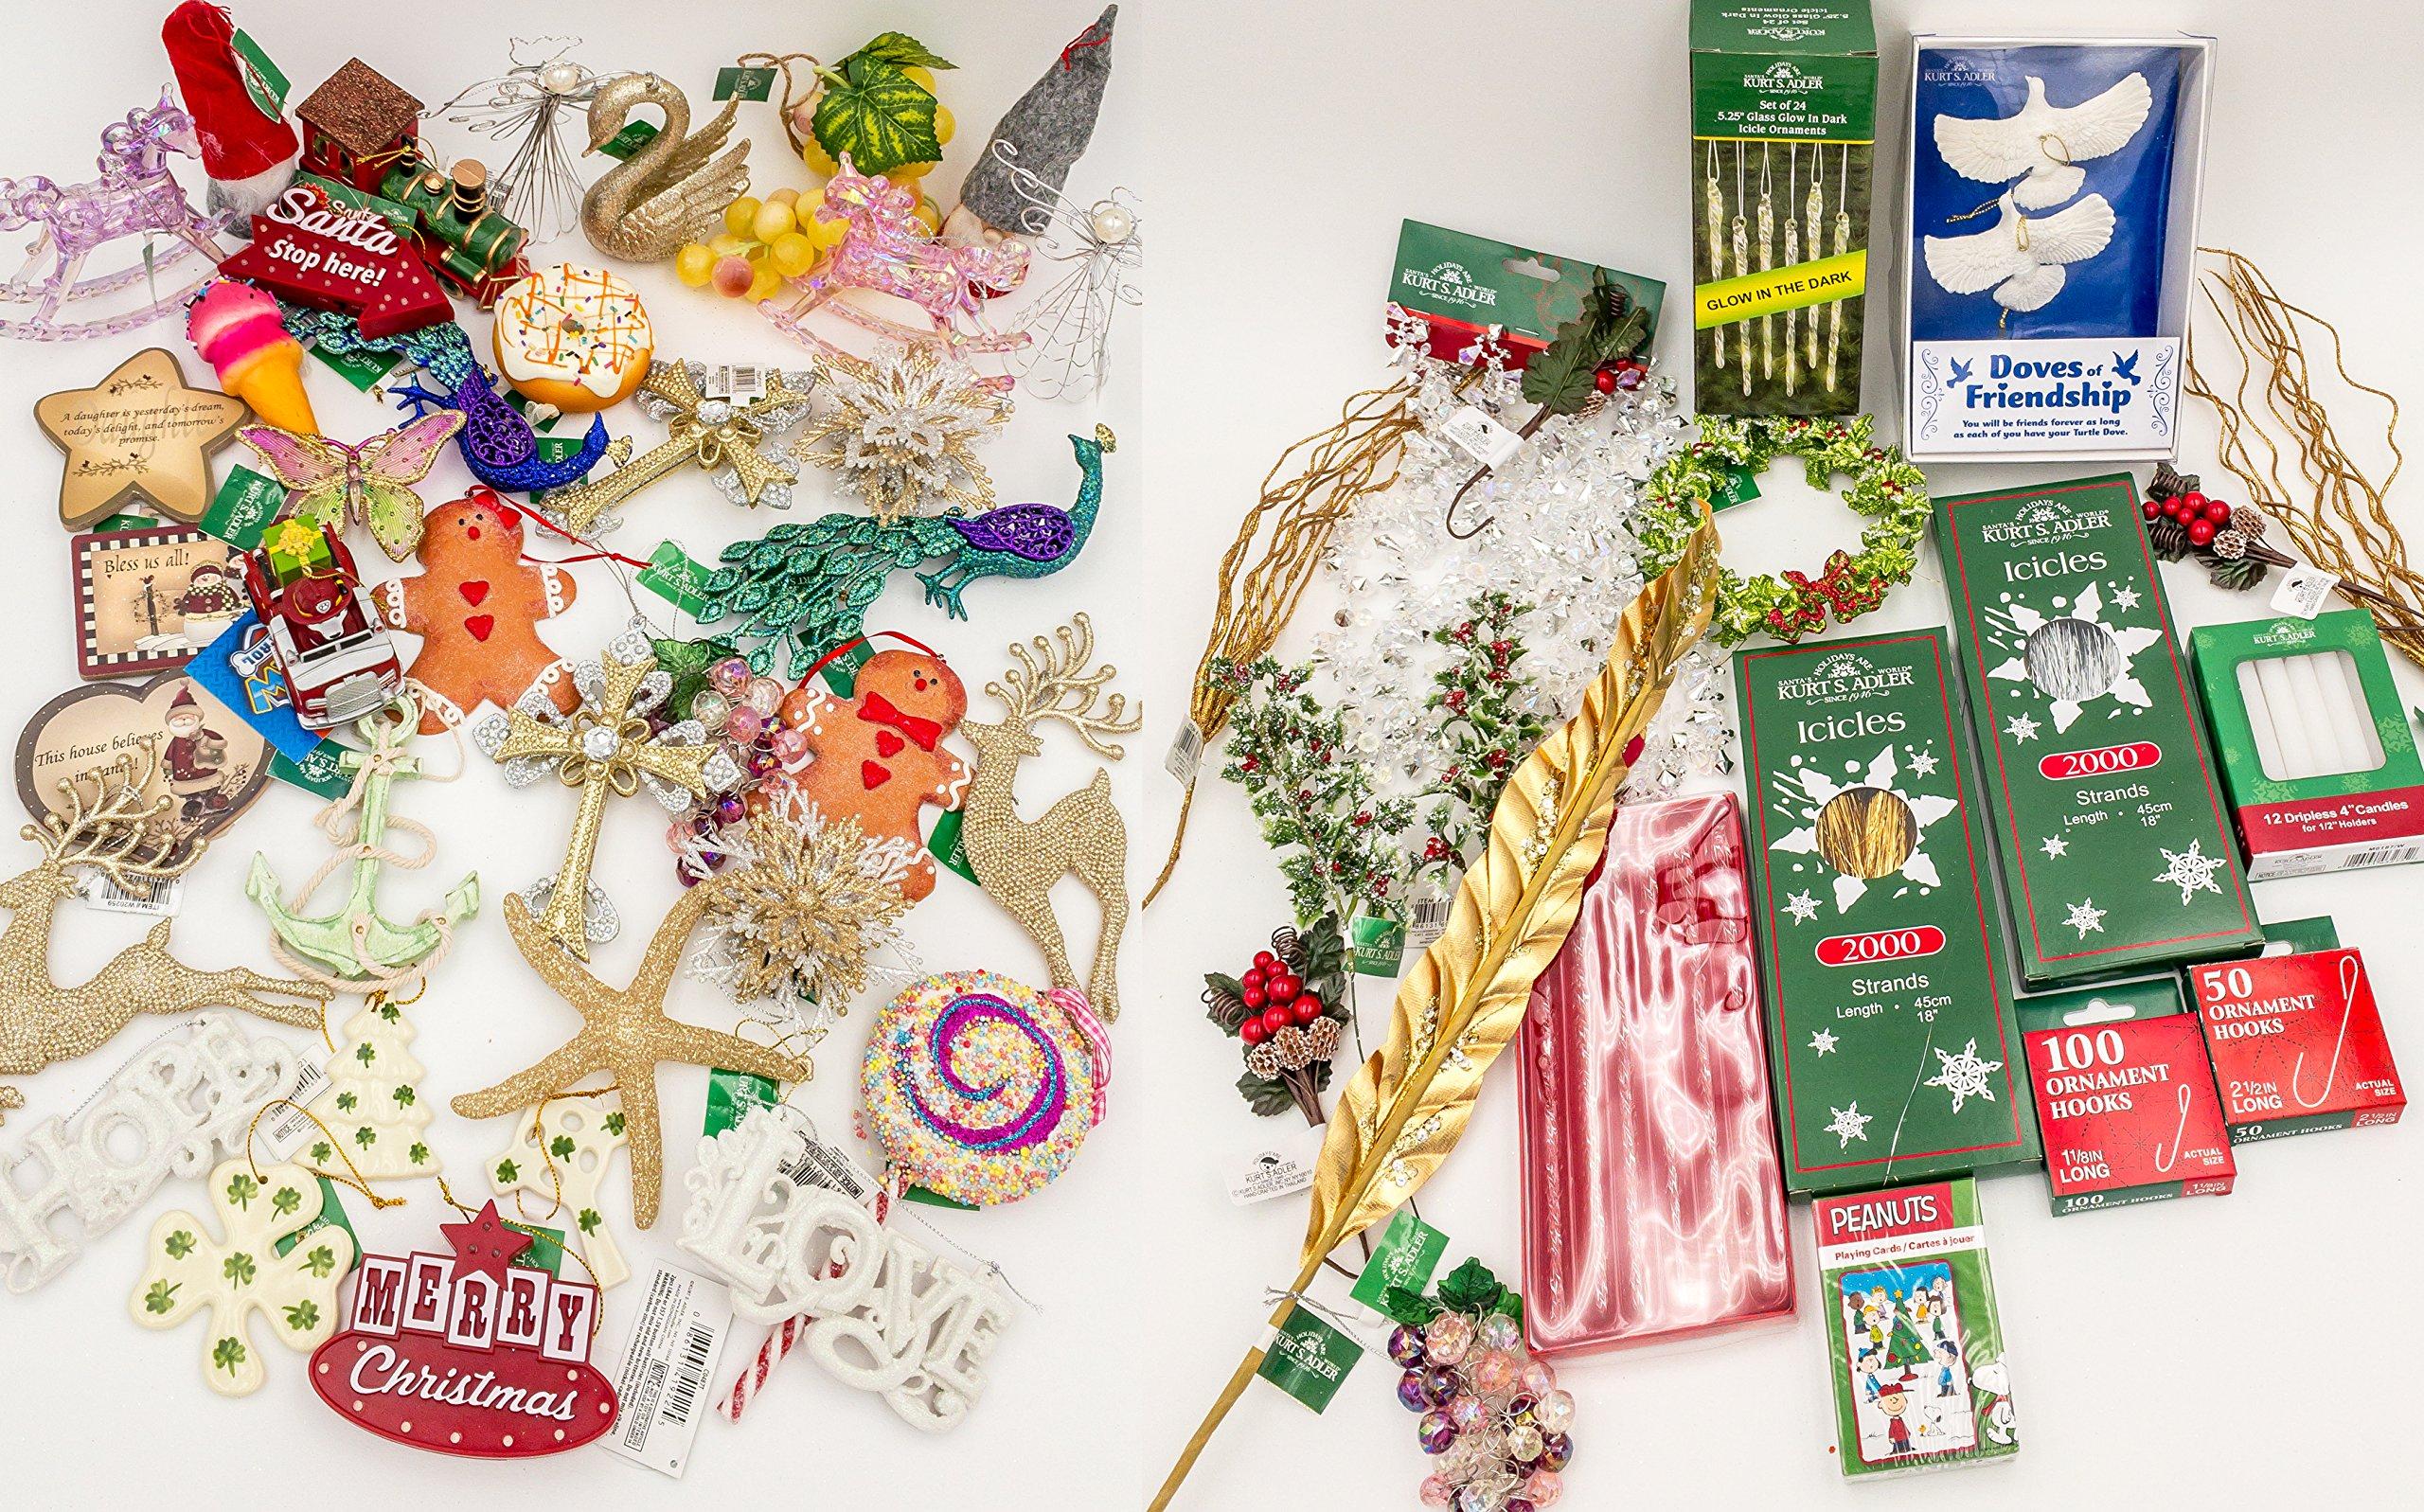 JZ Bundles Large Set - Best of Christmas - Kurt Adler - 57-Piece Bundle - A Bundle of Christmas Ornaments Great Gift